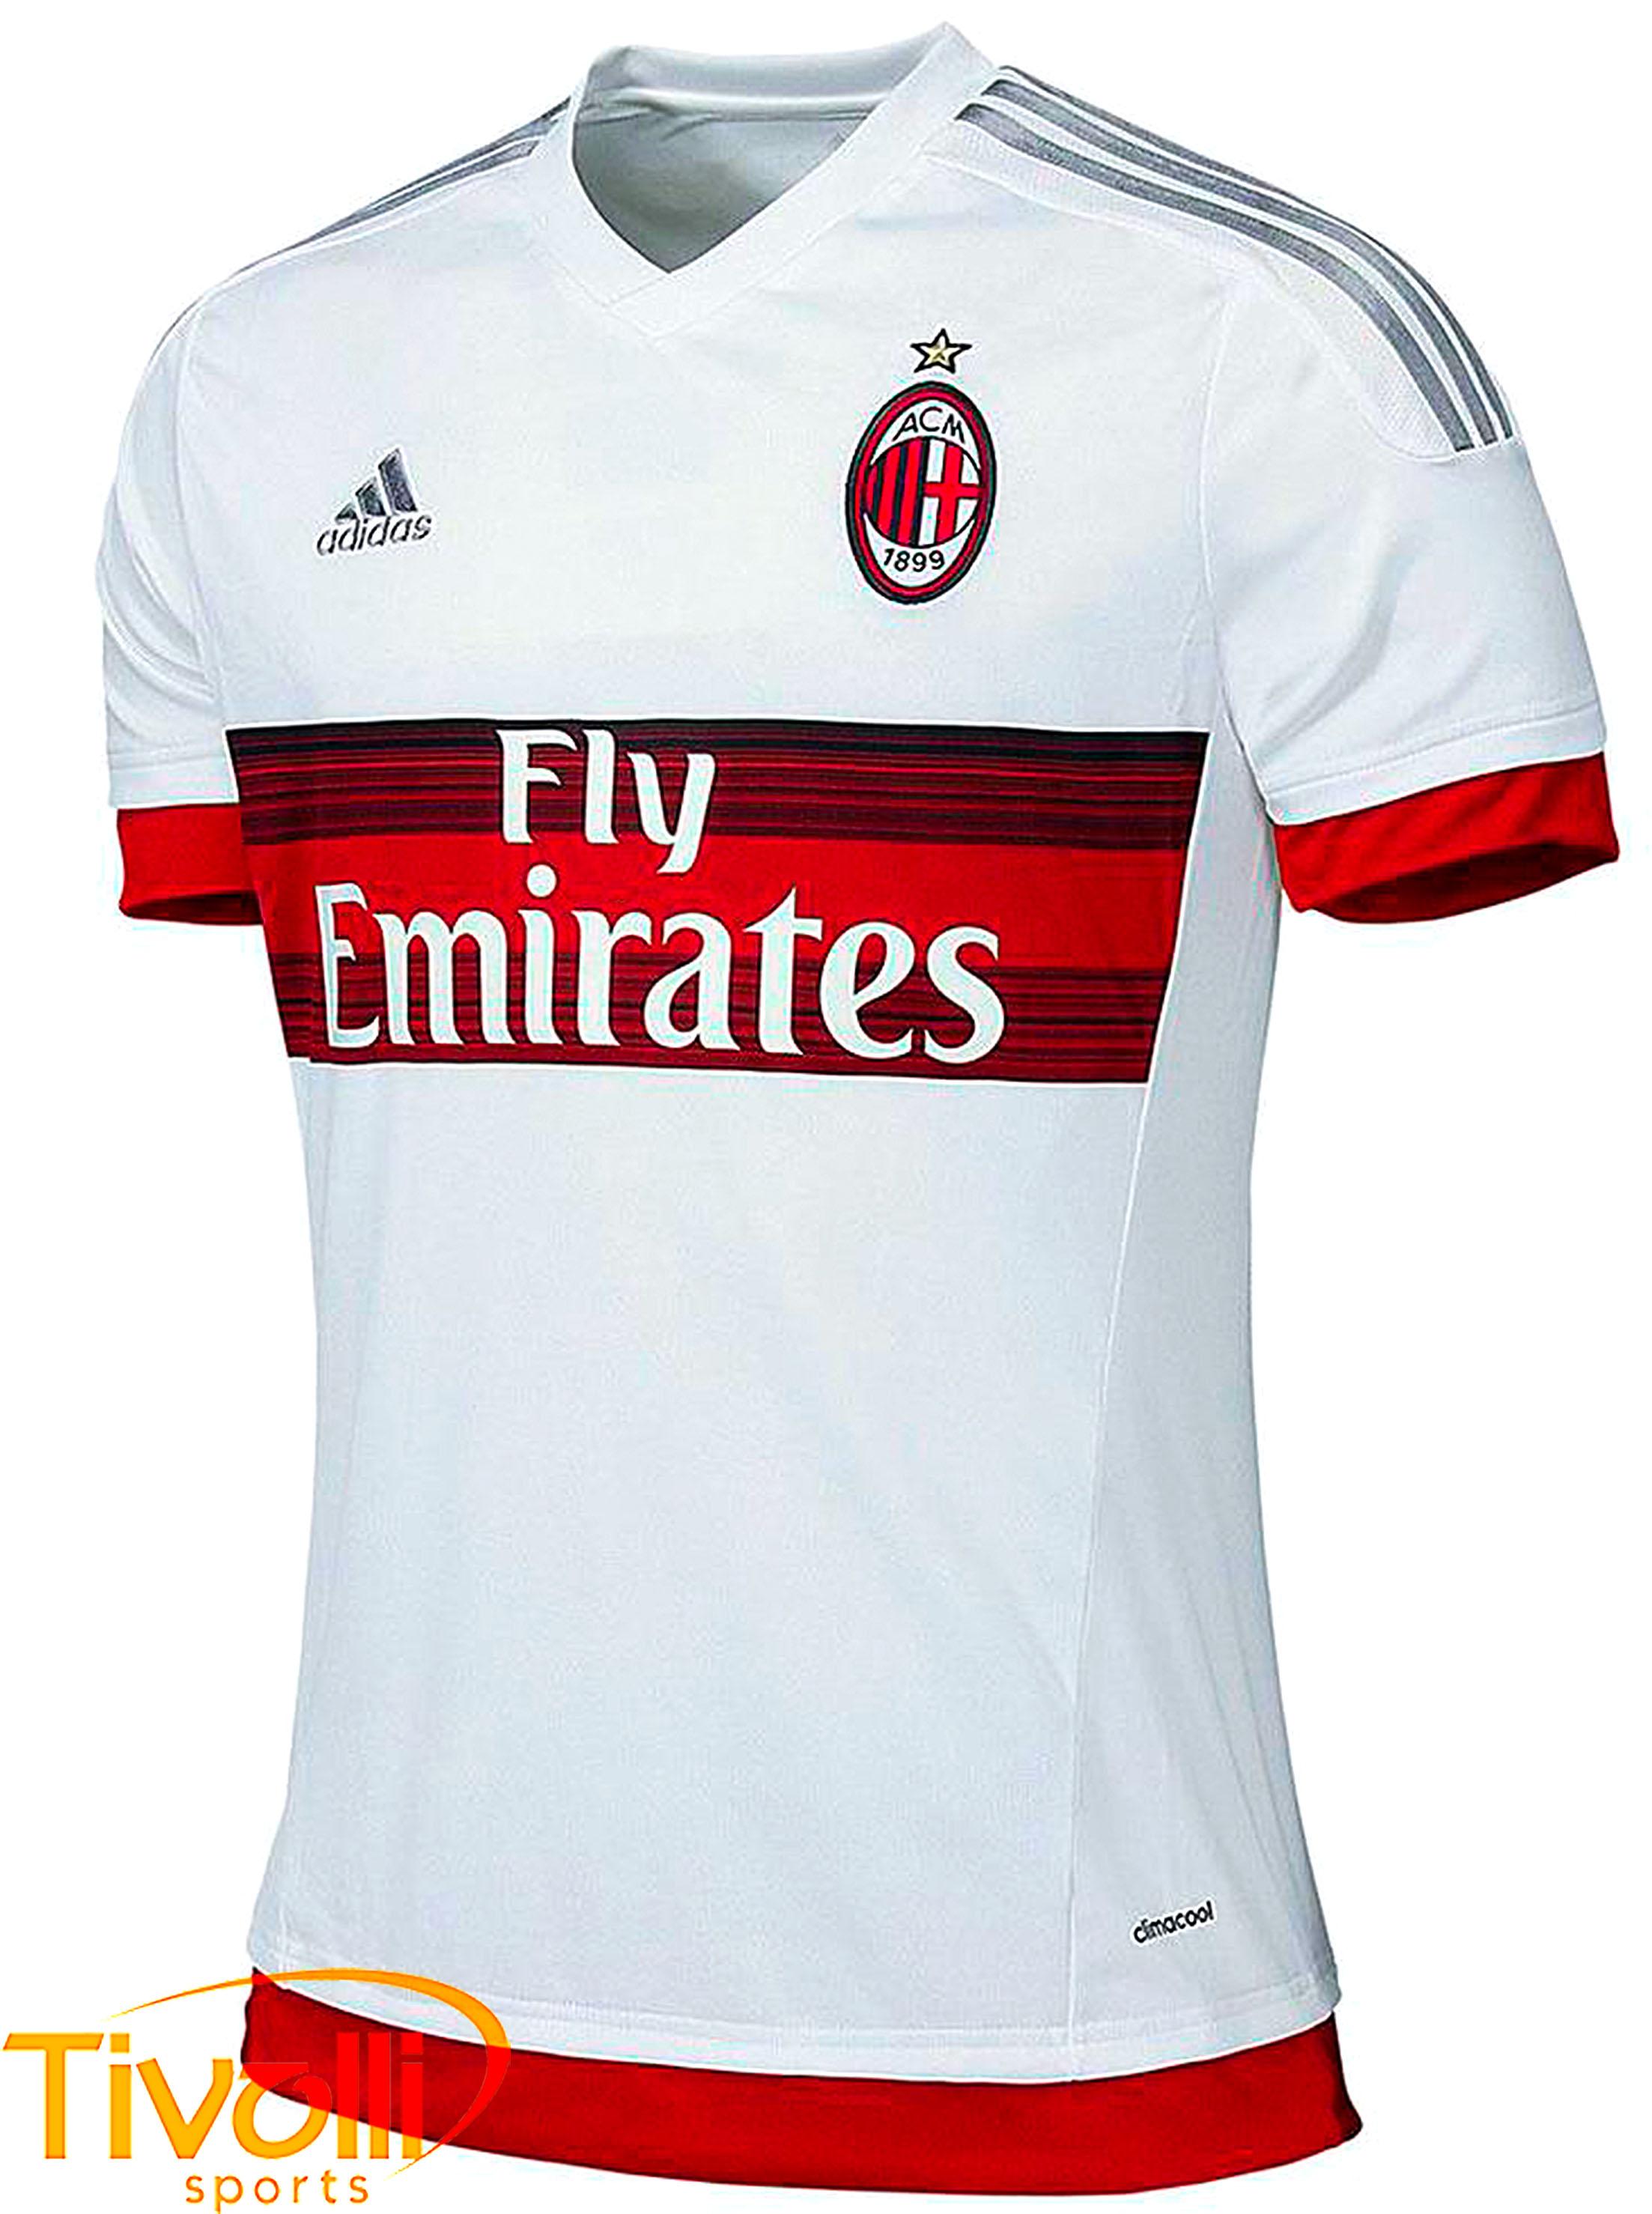 Camisa Milan II 2015 2016 Adidas   - Mega Saldão   375255050af1d